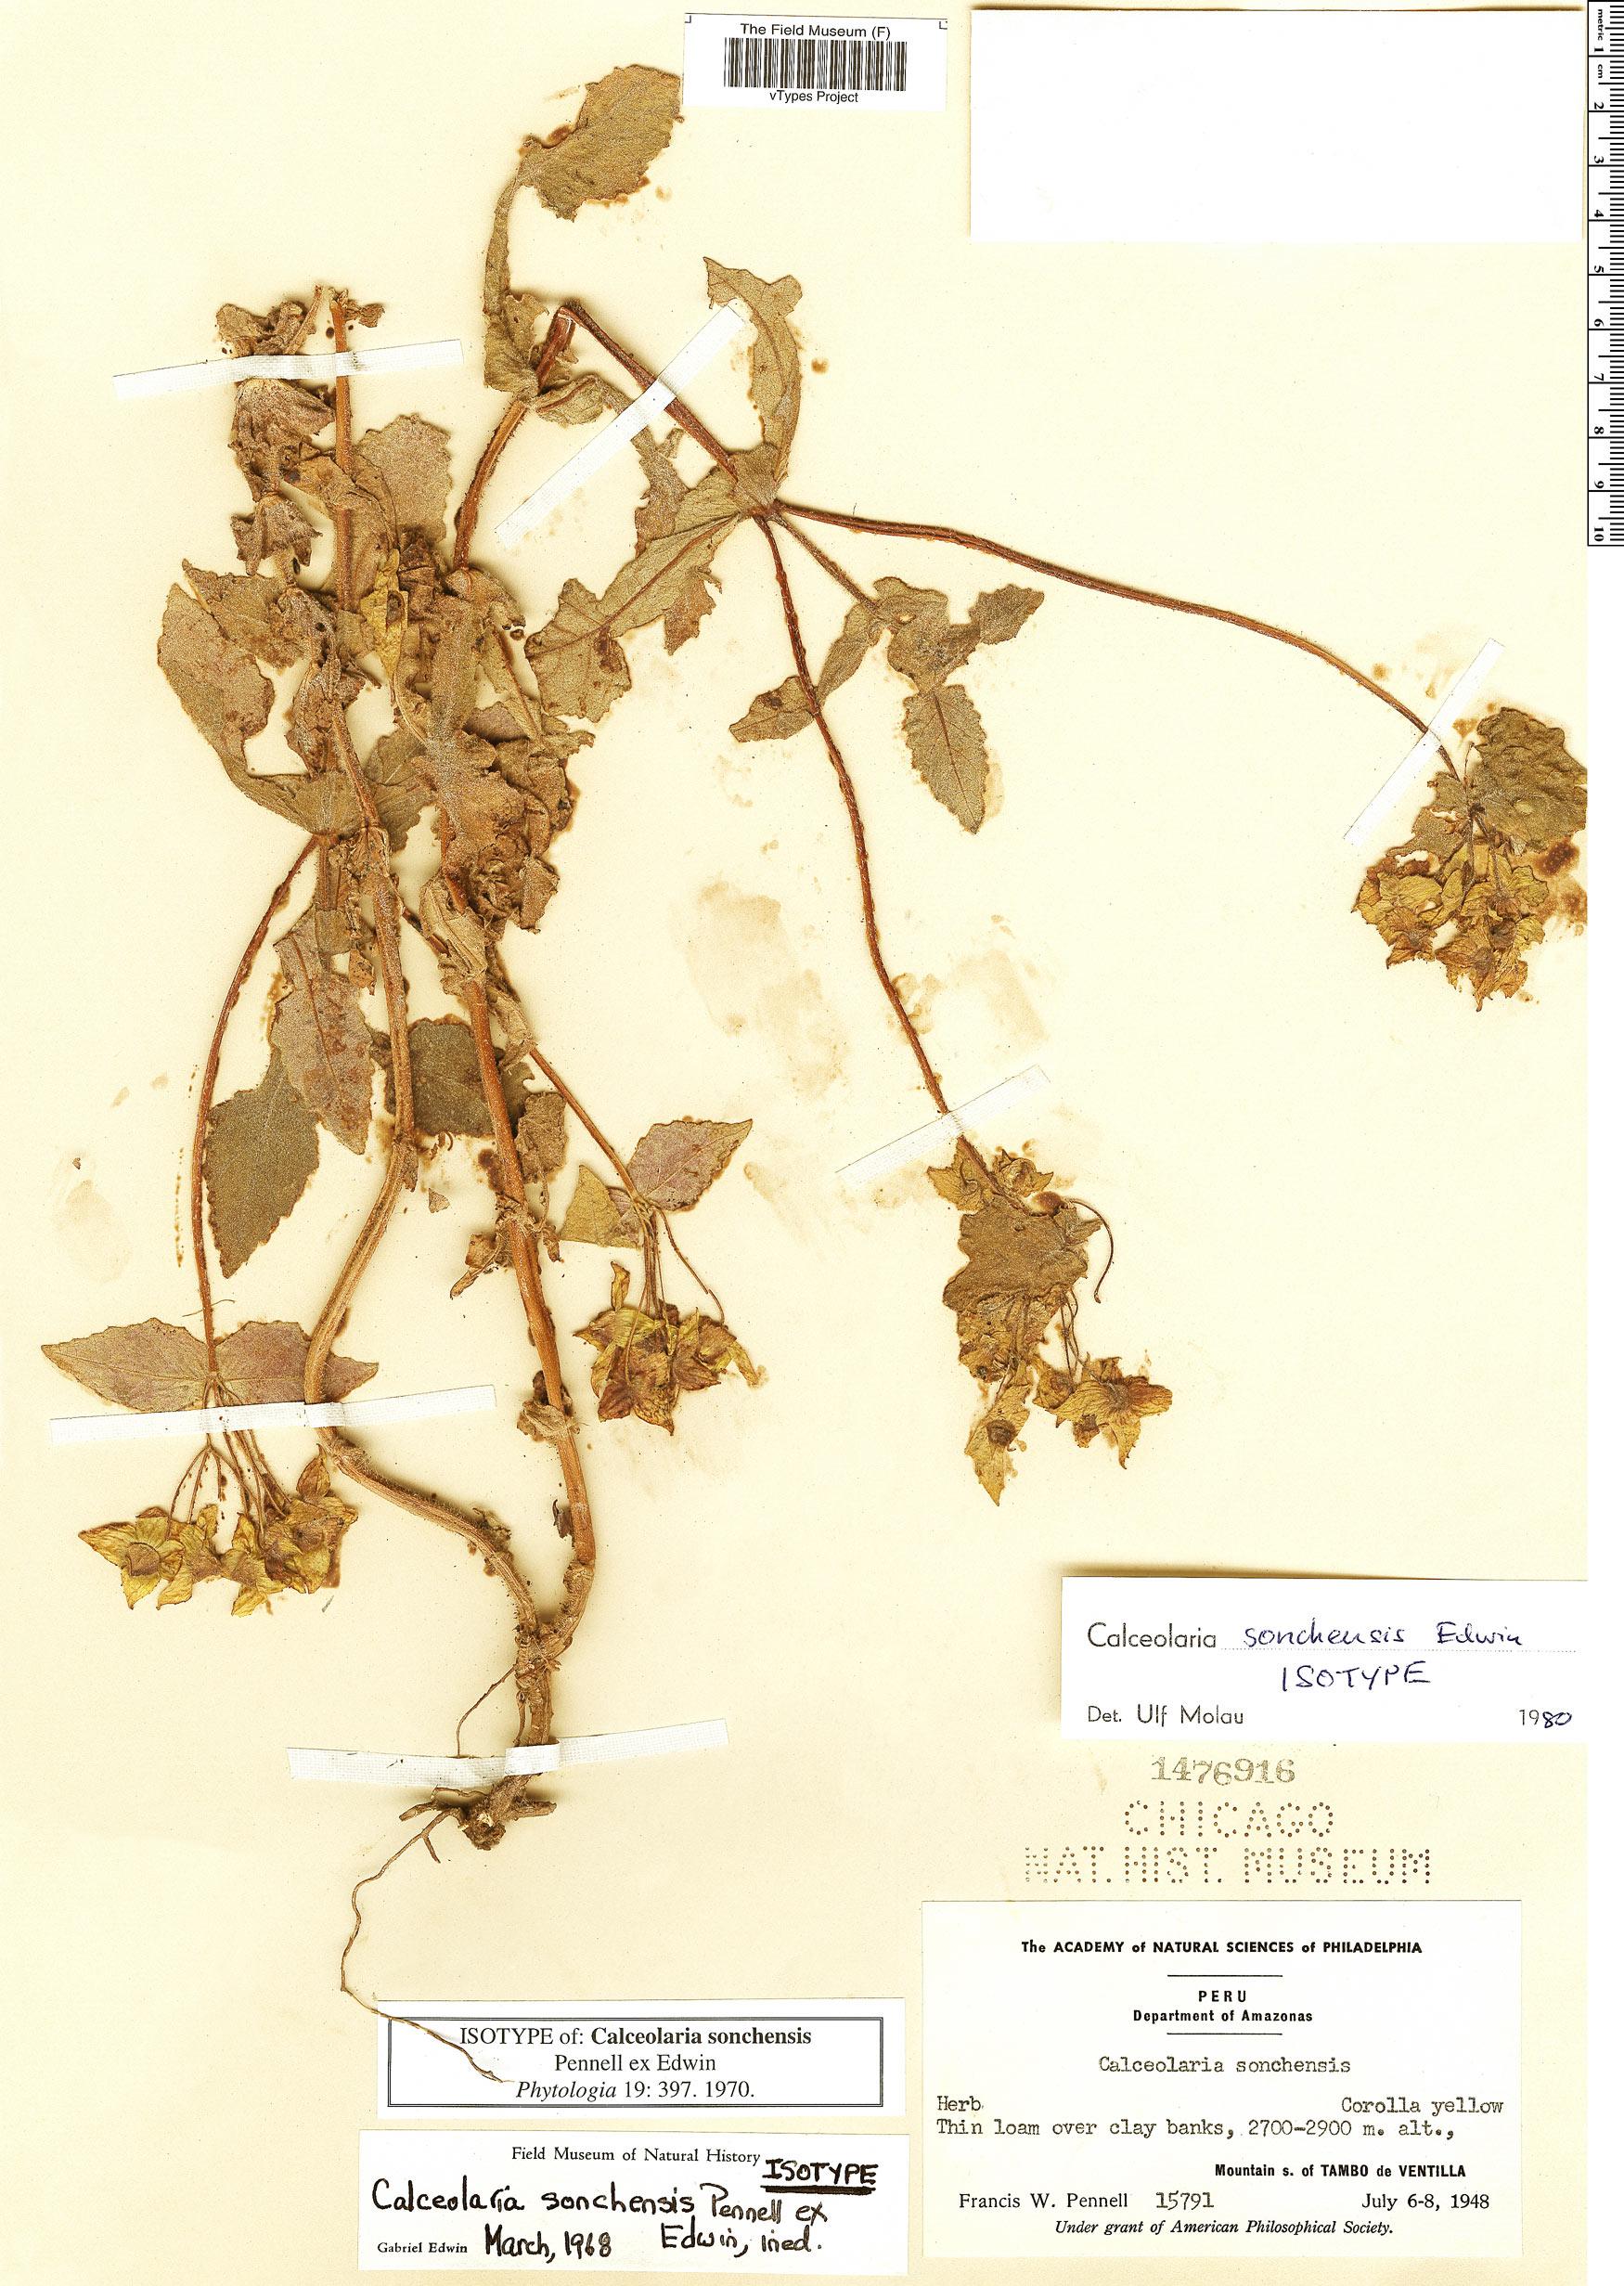 Specimen: Calceolaria sonchensis